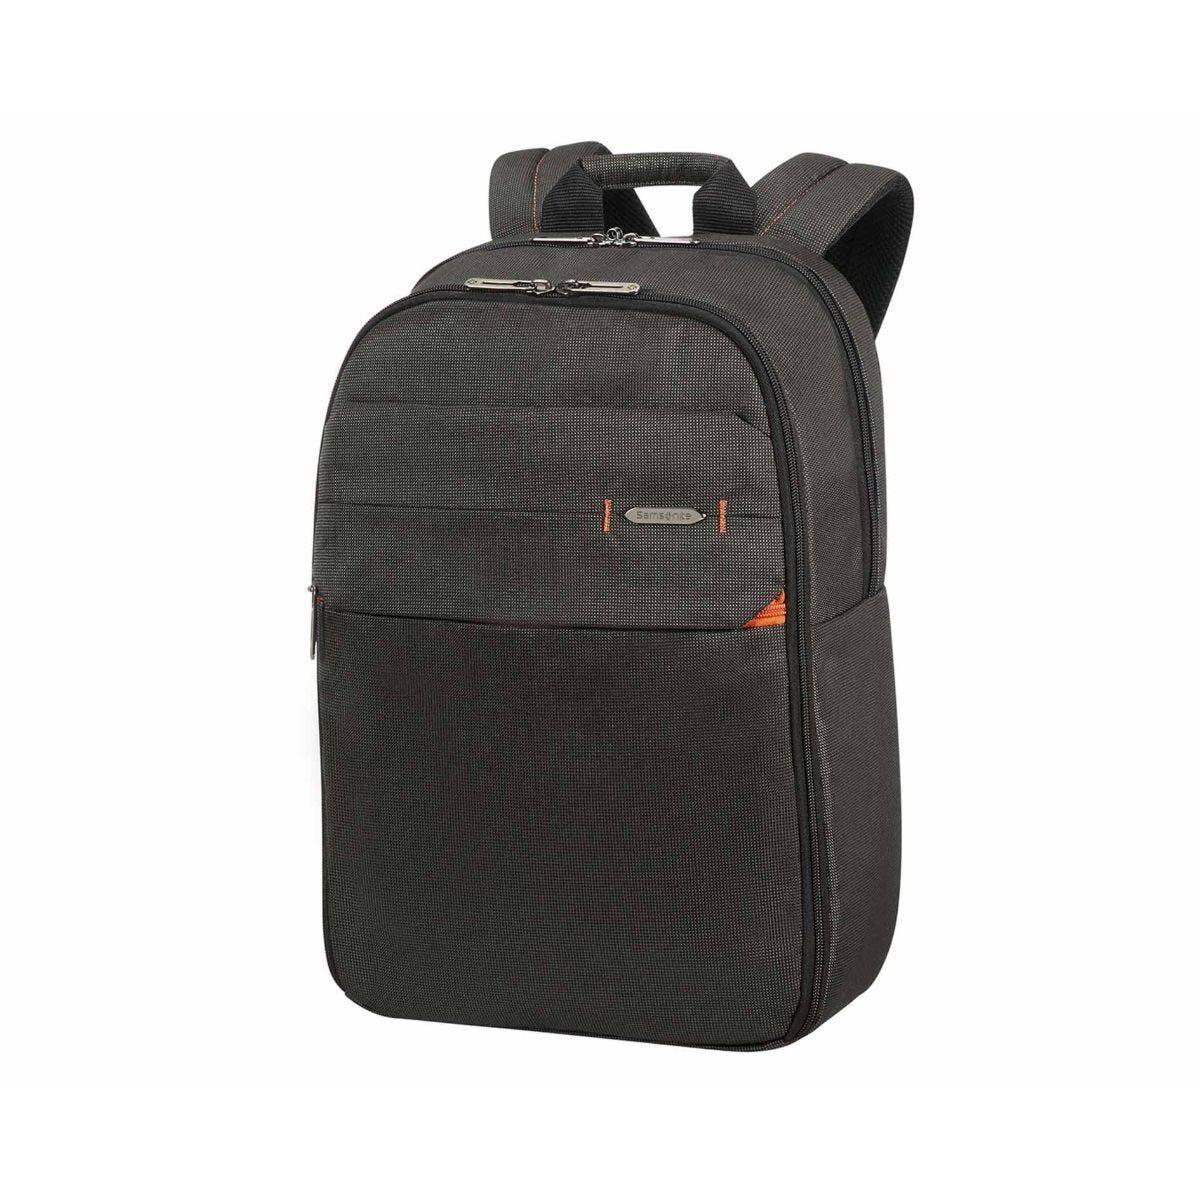 Samsonite Network 3 Laptop Backpack 15.6 Inch Charcoal